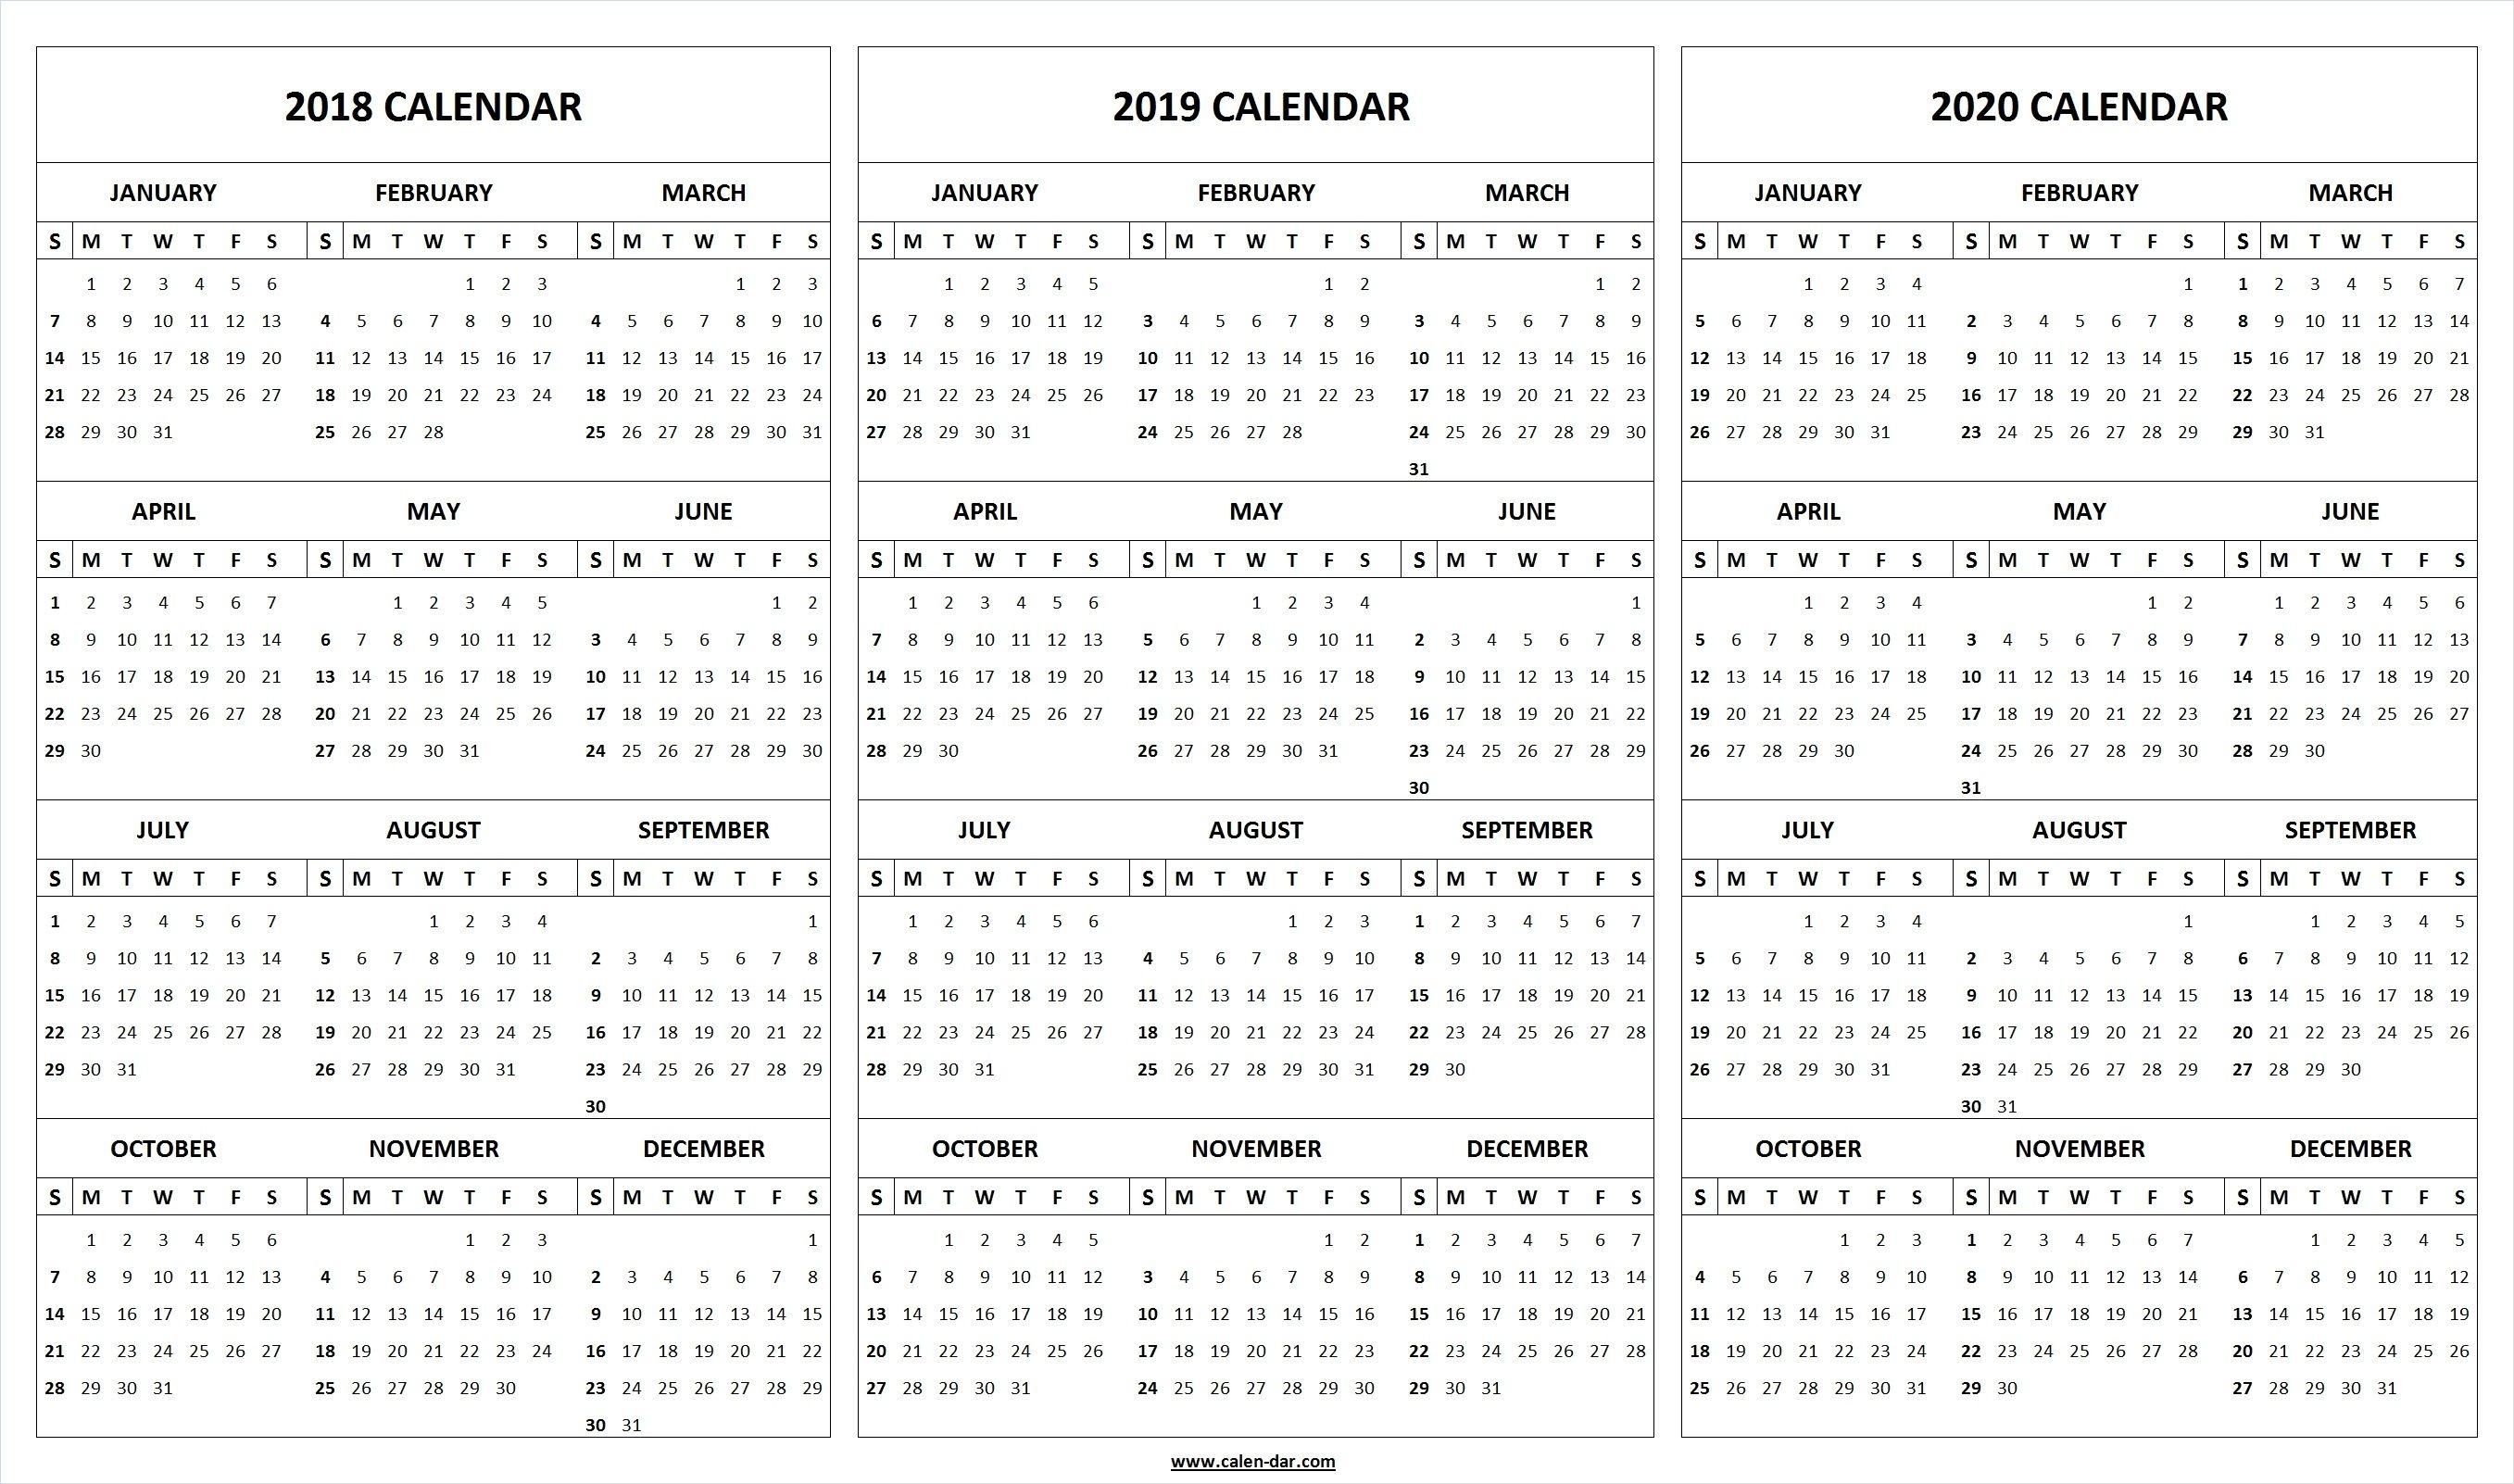 Print Blank 2018 2019 2020 Calendar Template   Organize!   Printable regarding Google Calendar Printable 2019 2020